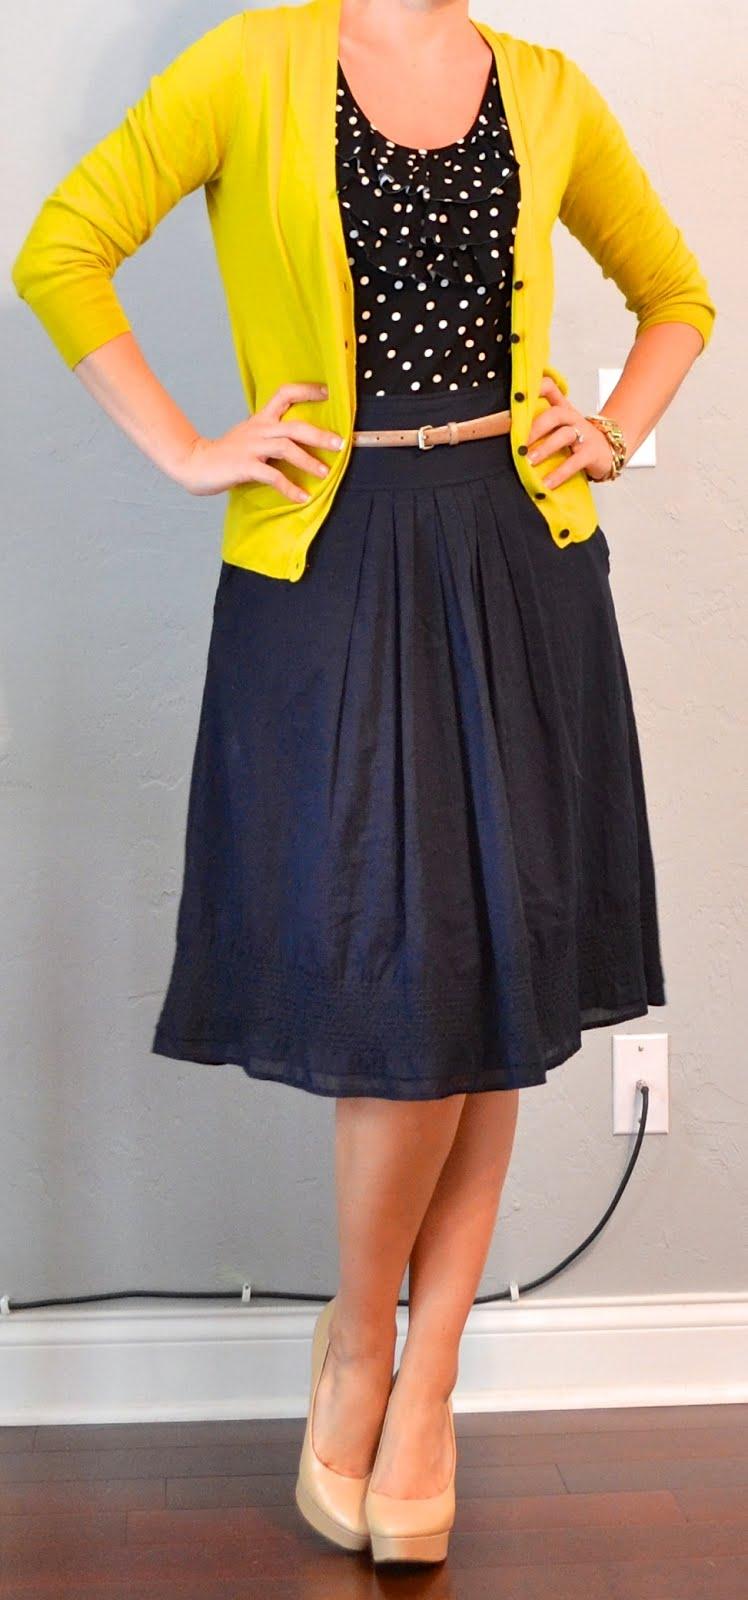 outfit post: navy & white polka-dot dress, navy cardigan